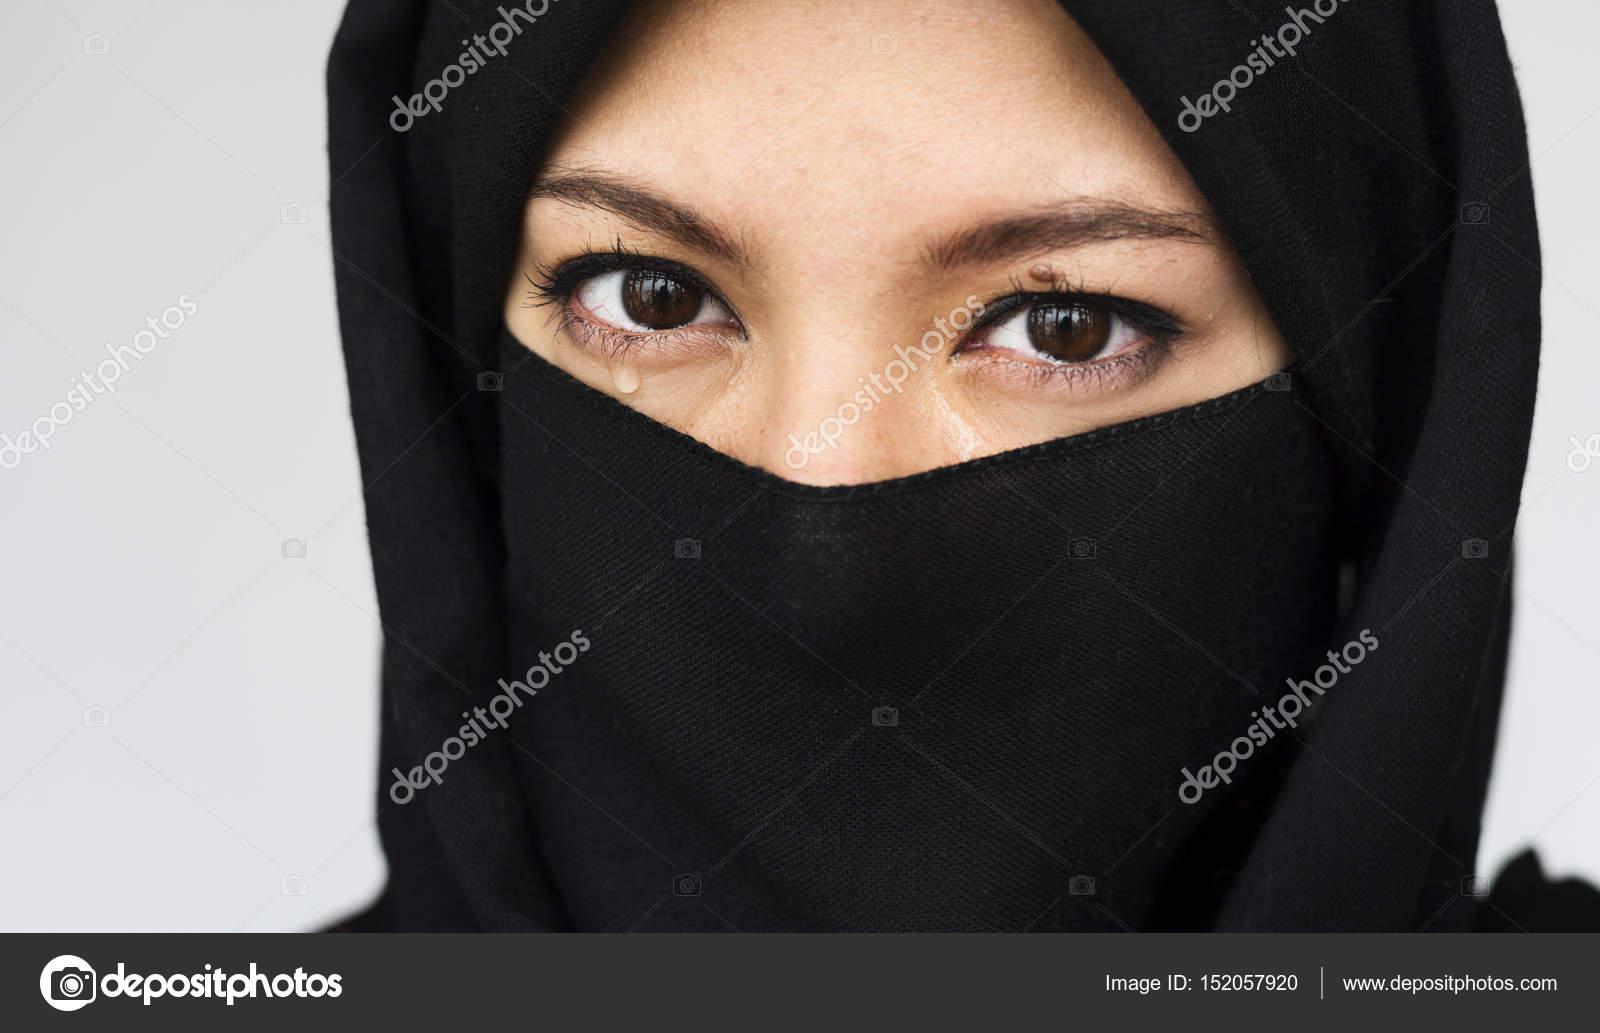 purdah のイスラム教徒の女性の肖像画 ストック写真 rawpixel 152057920